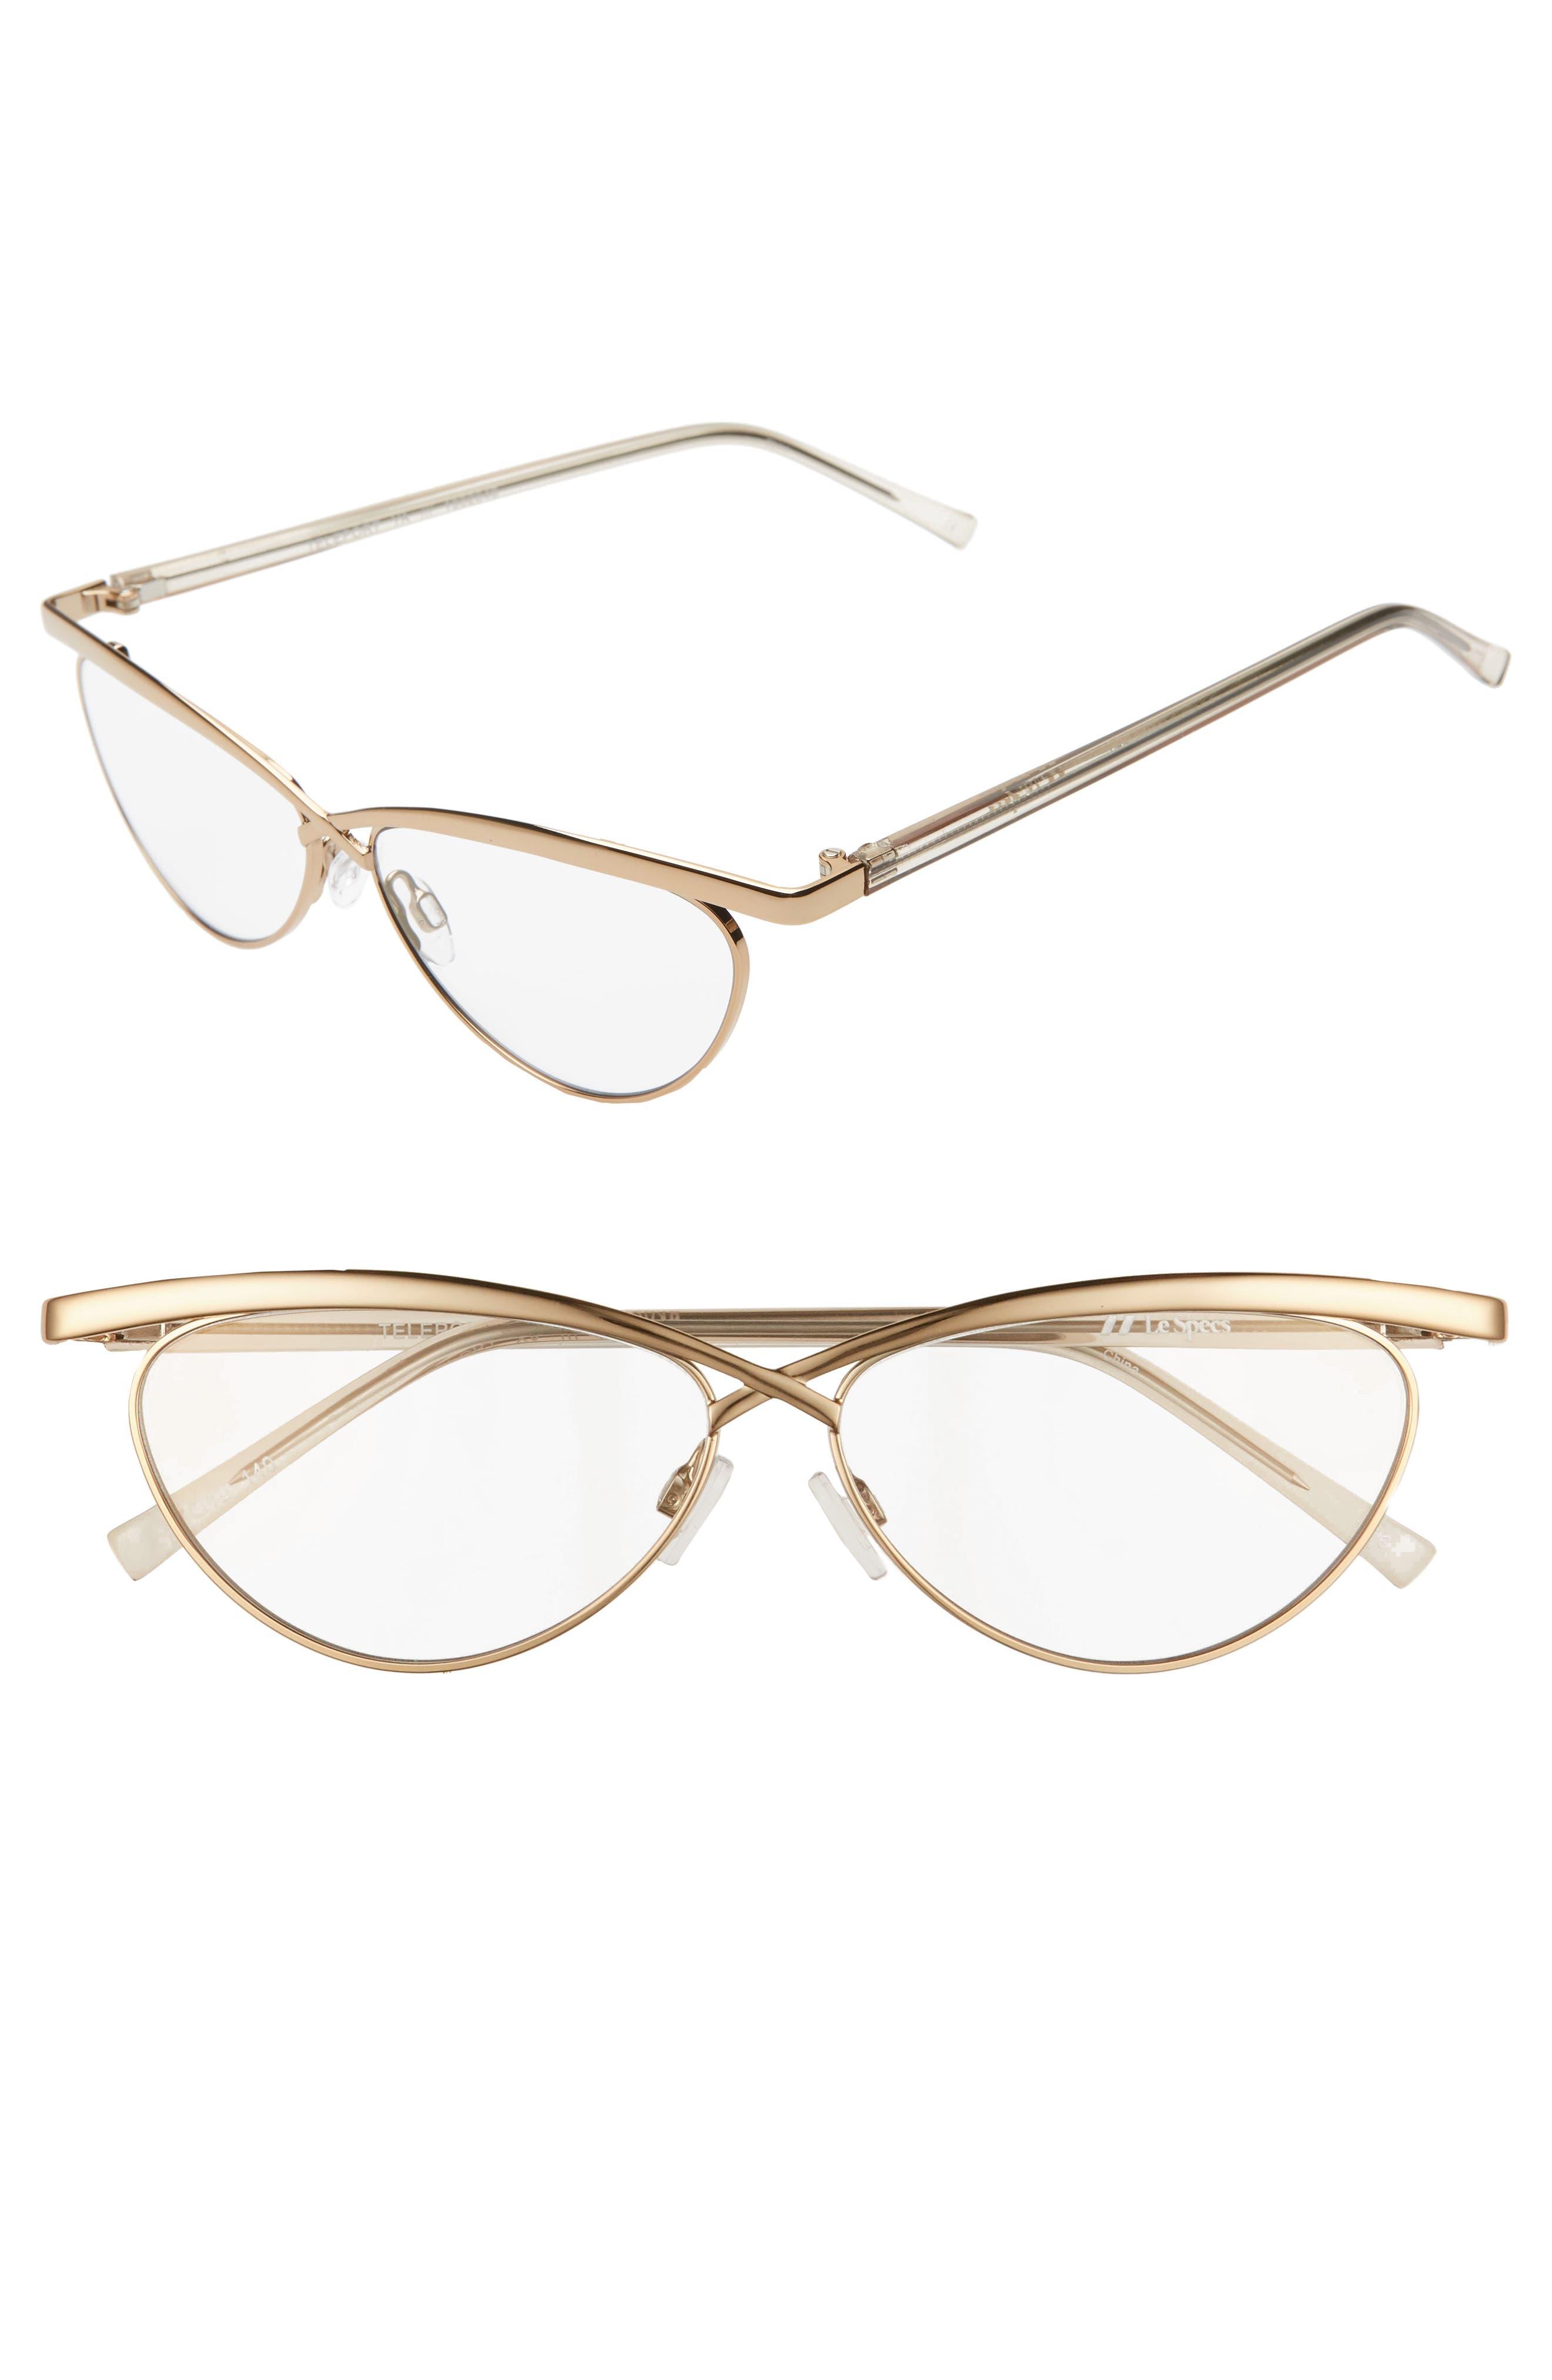 Le Specs Teleport Ya 57Mm Cat Eye Sunglasses - Gold/ Light Grey